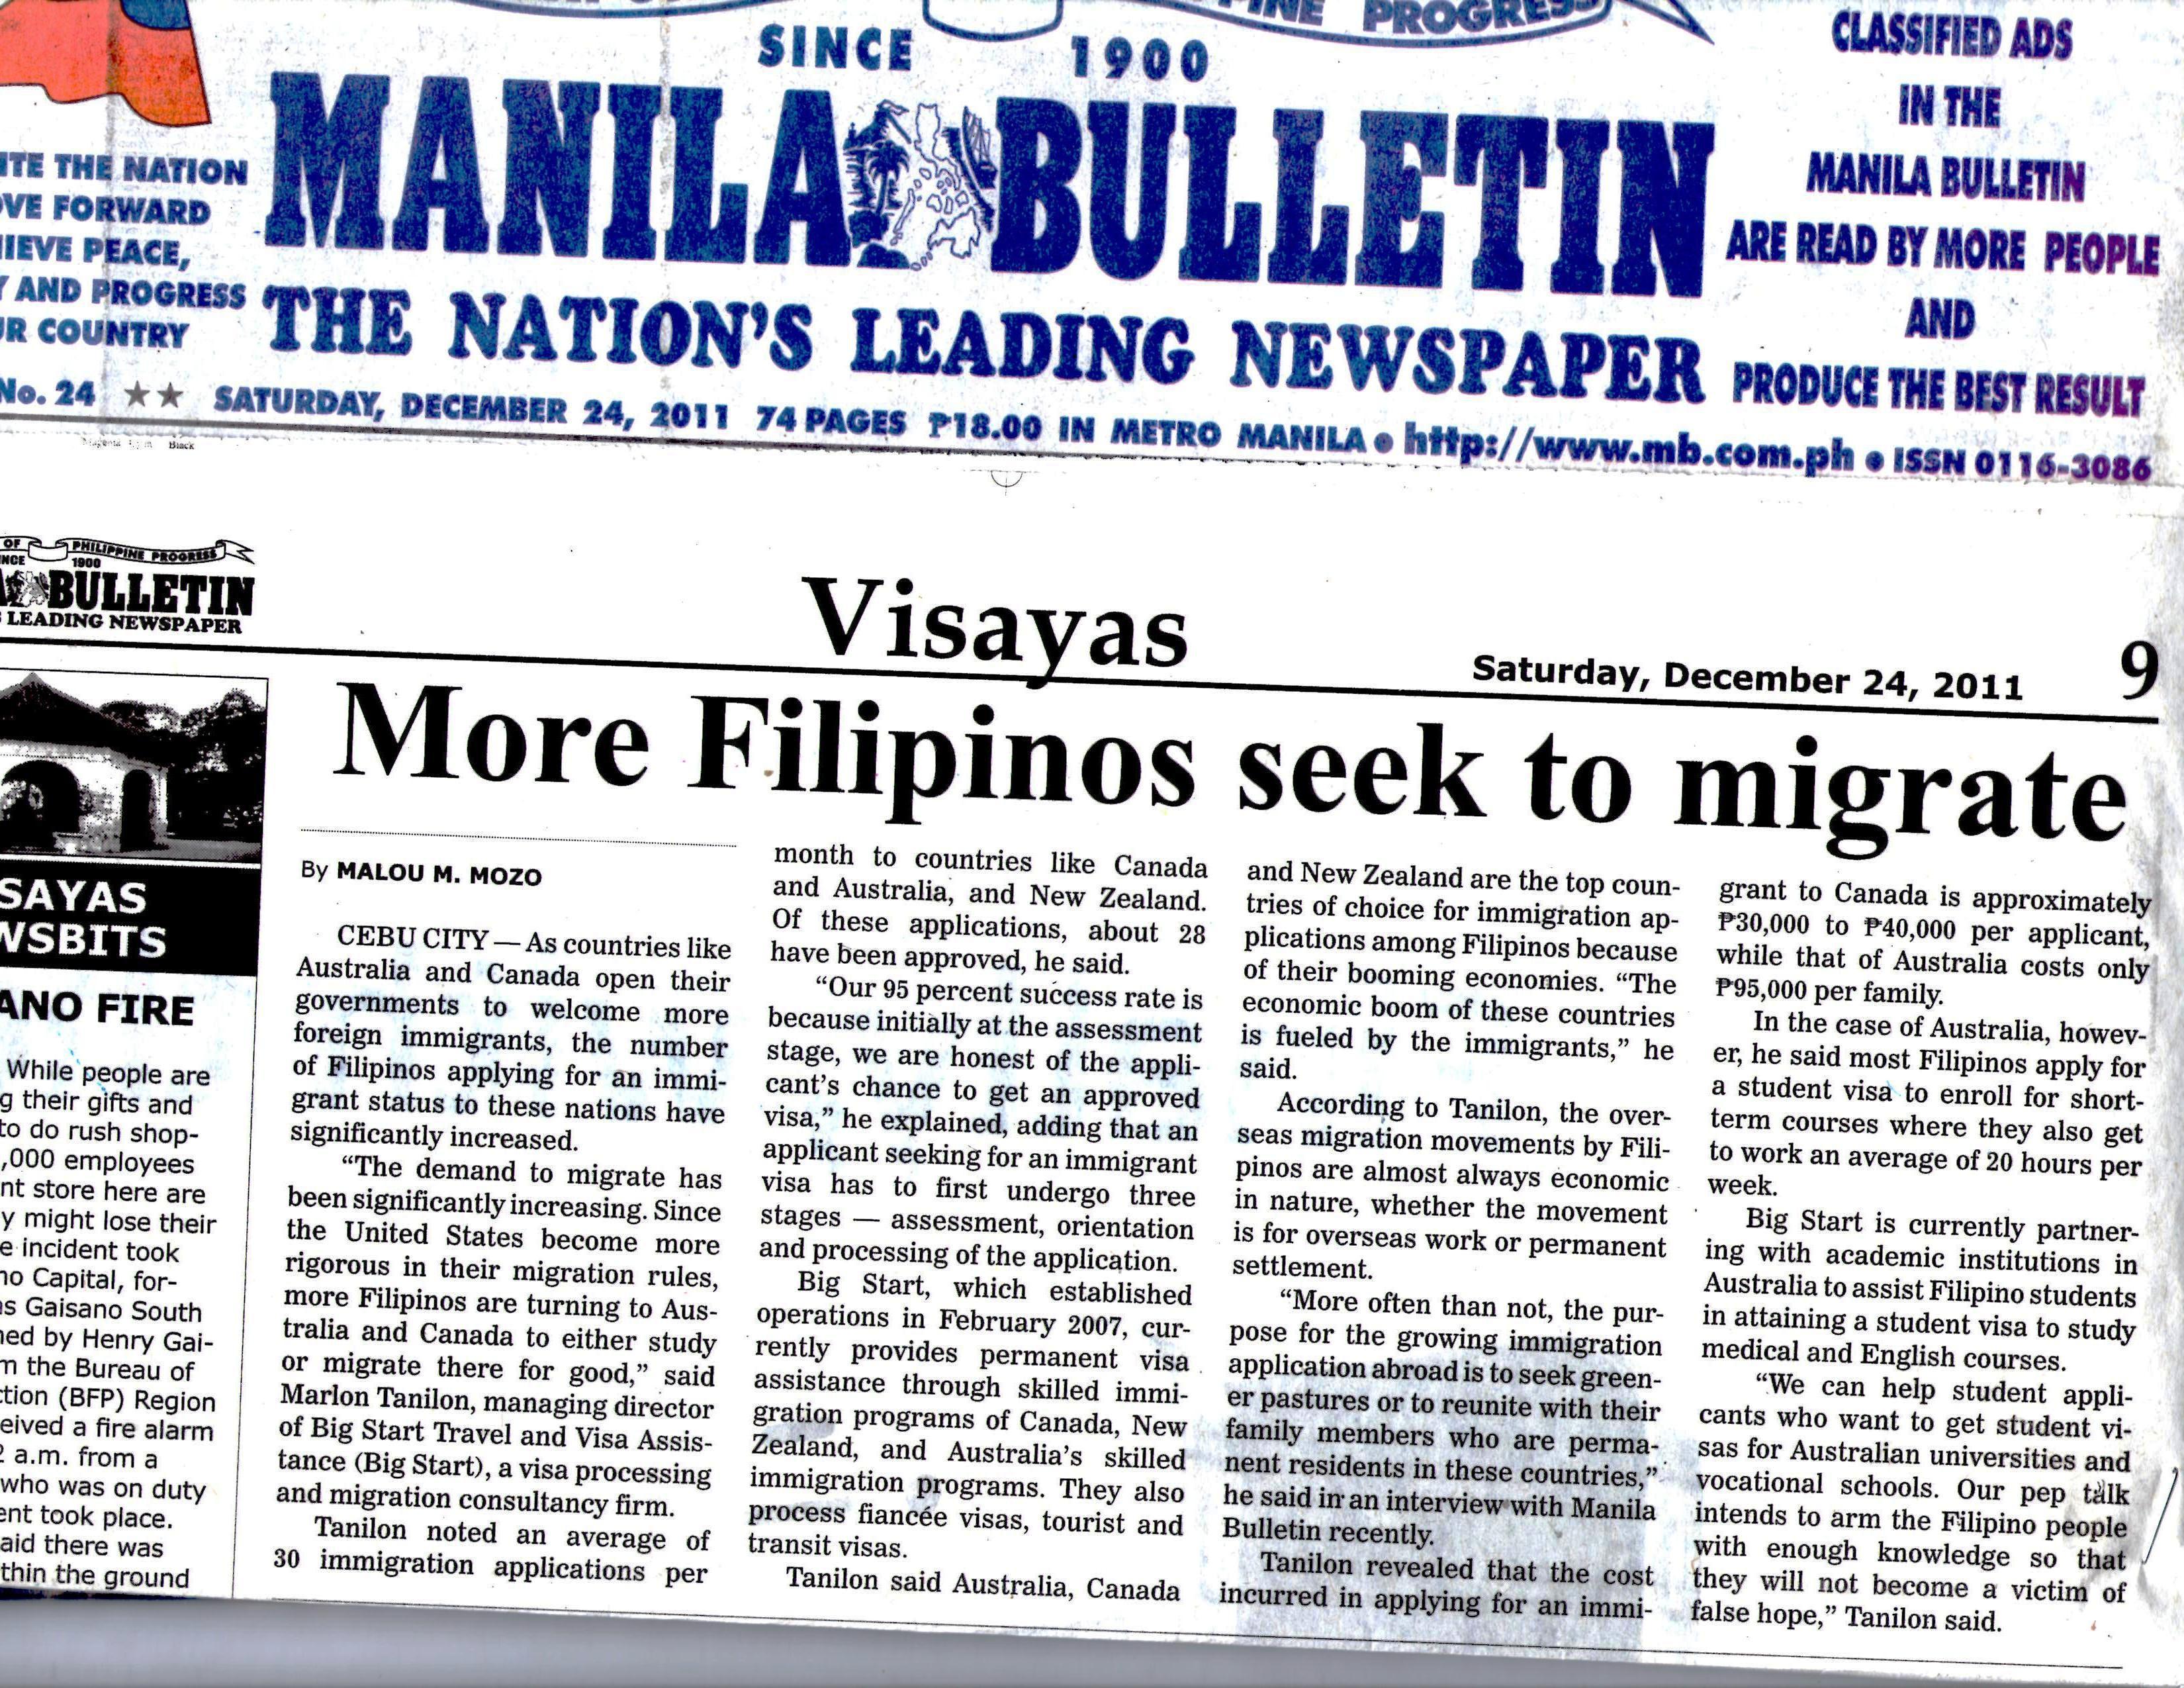 More Filipinos seek to migrate